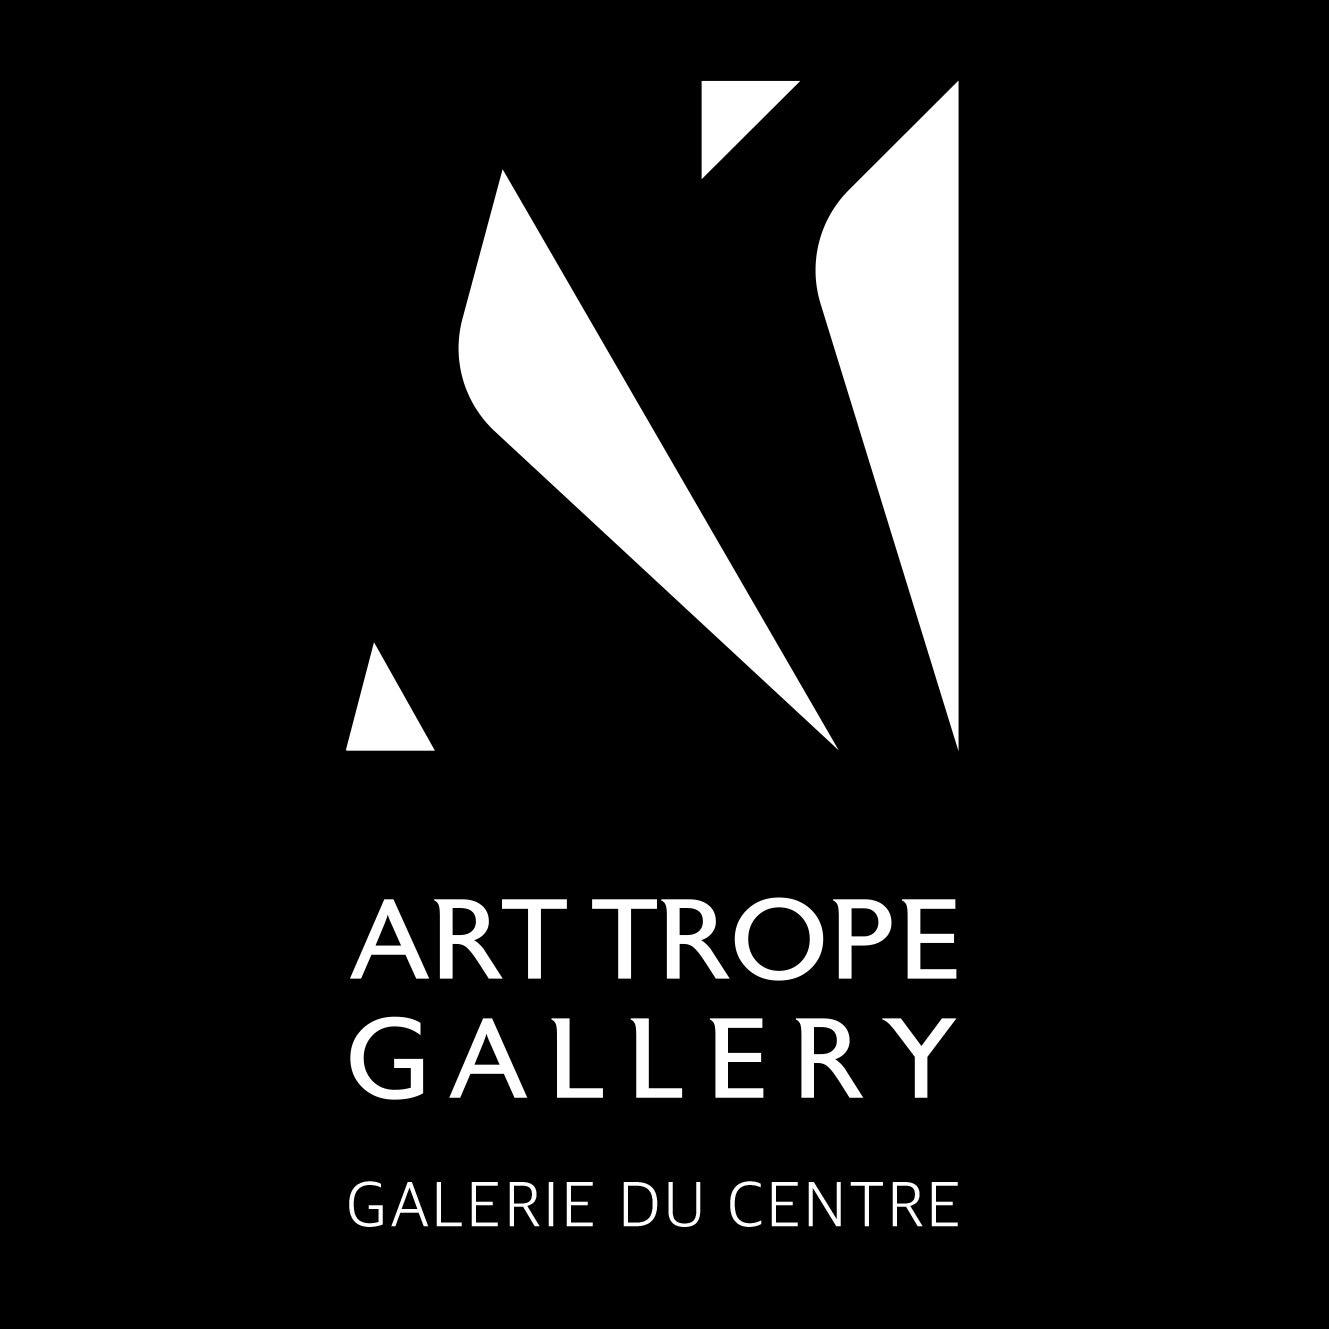 Art Trope Gallery - Galerie du Centre